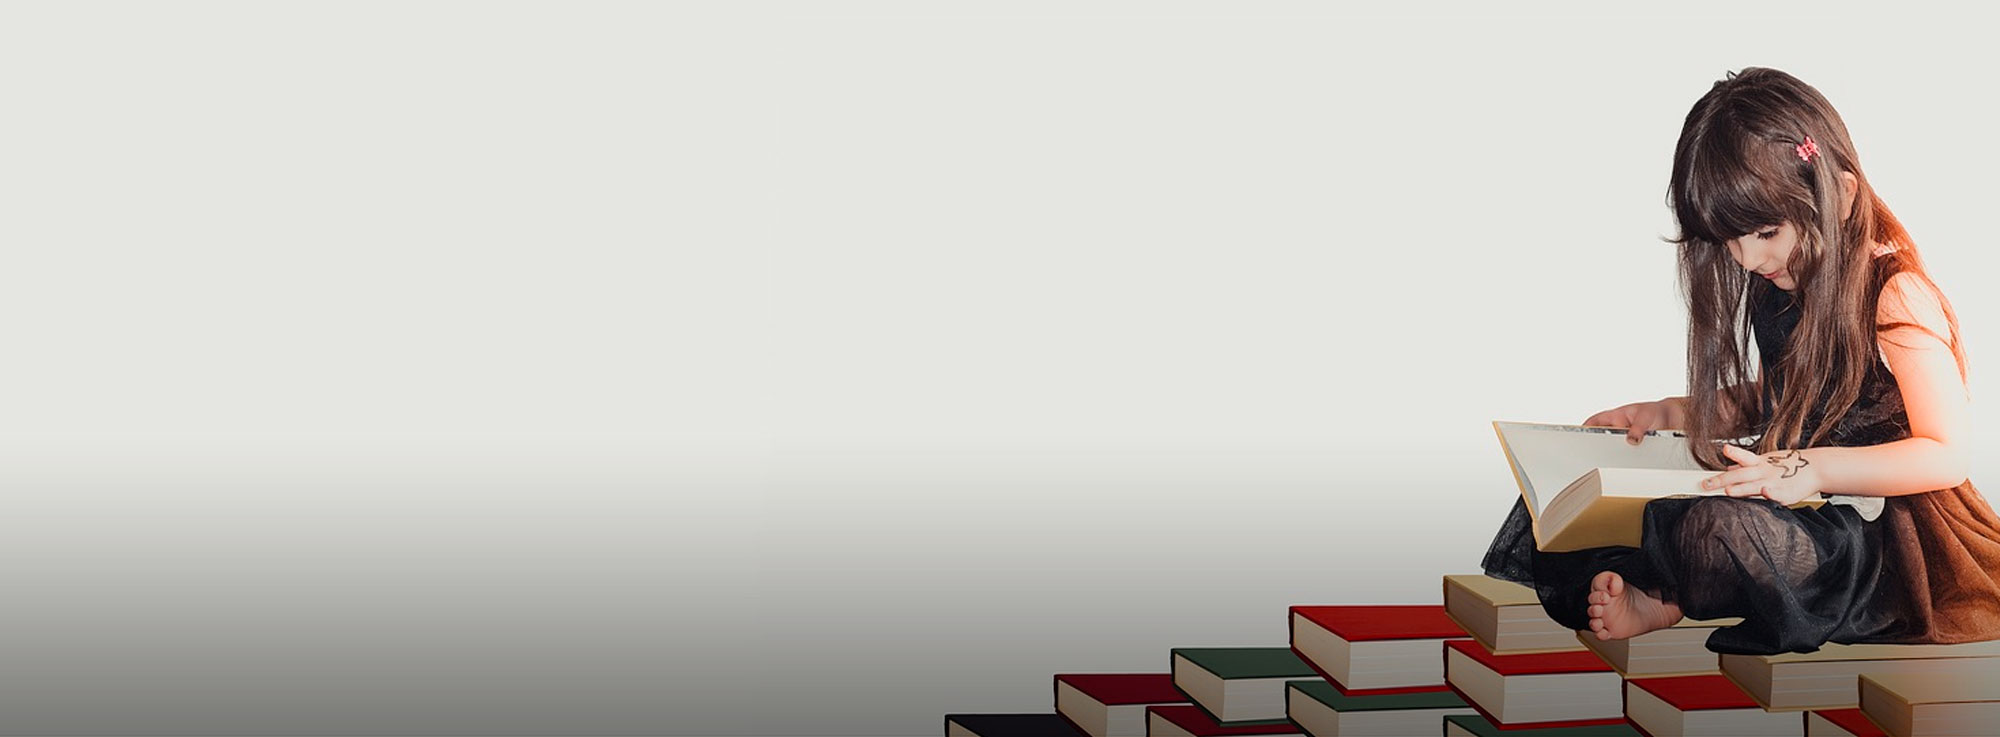 Martina Franca: Libriamoci 2018